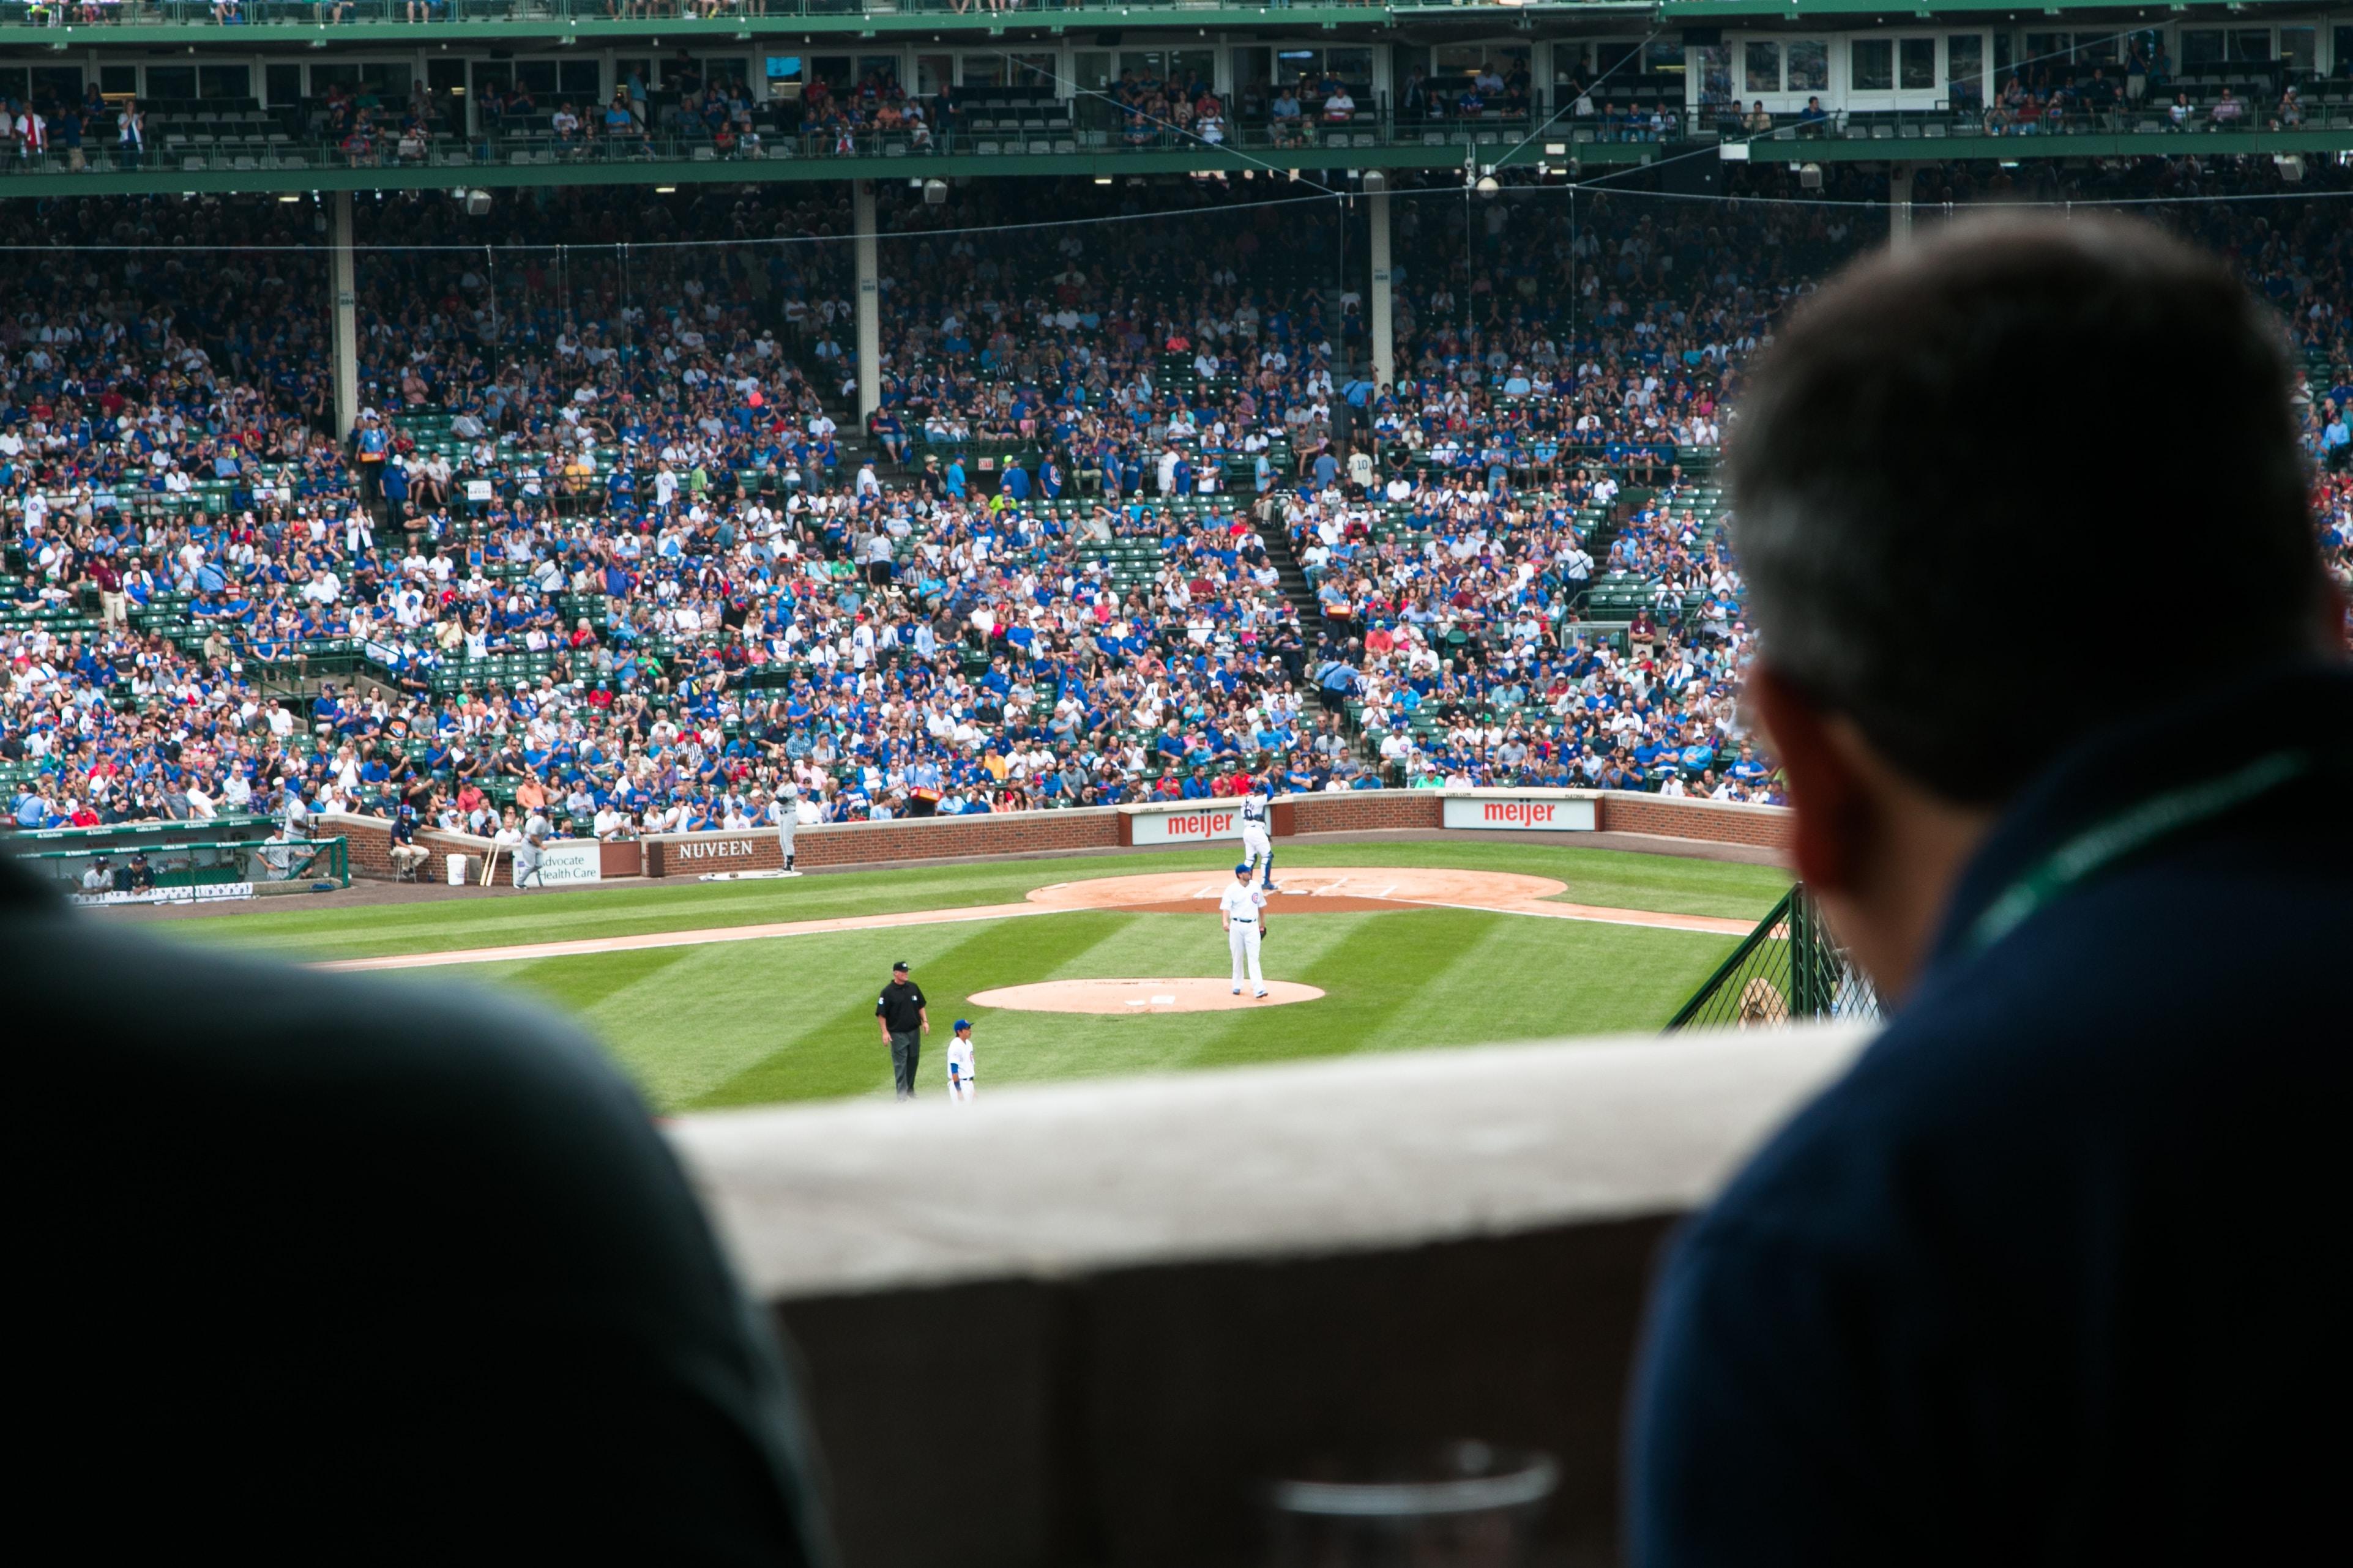 group of people watching baseball game